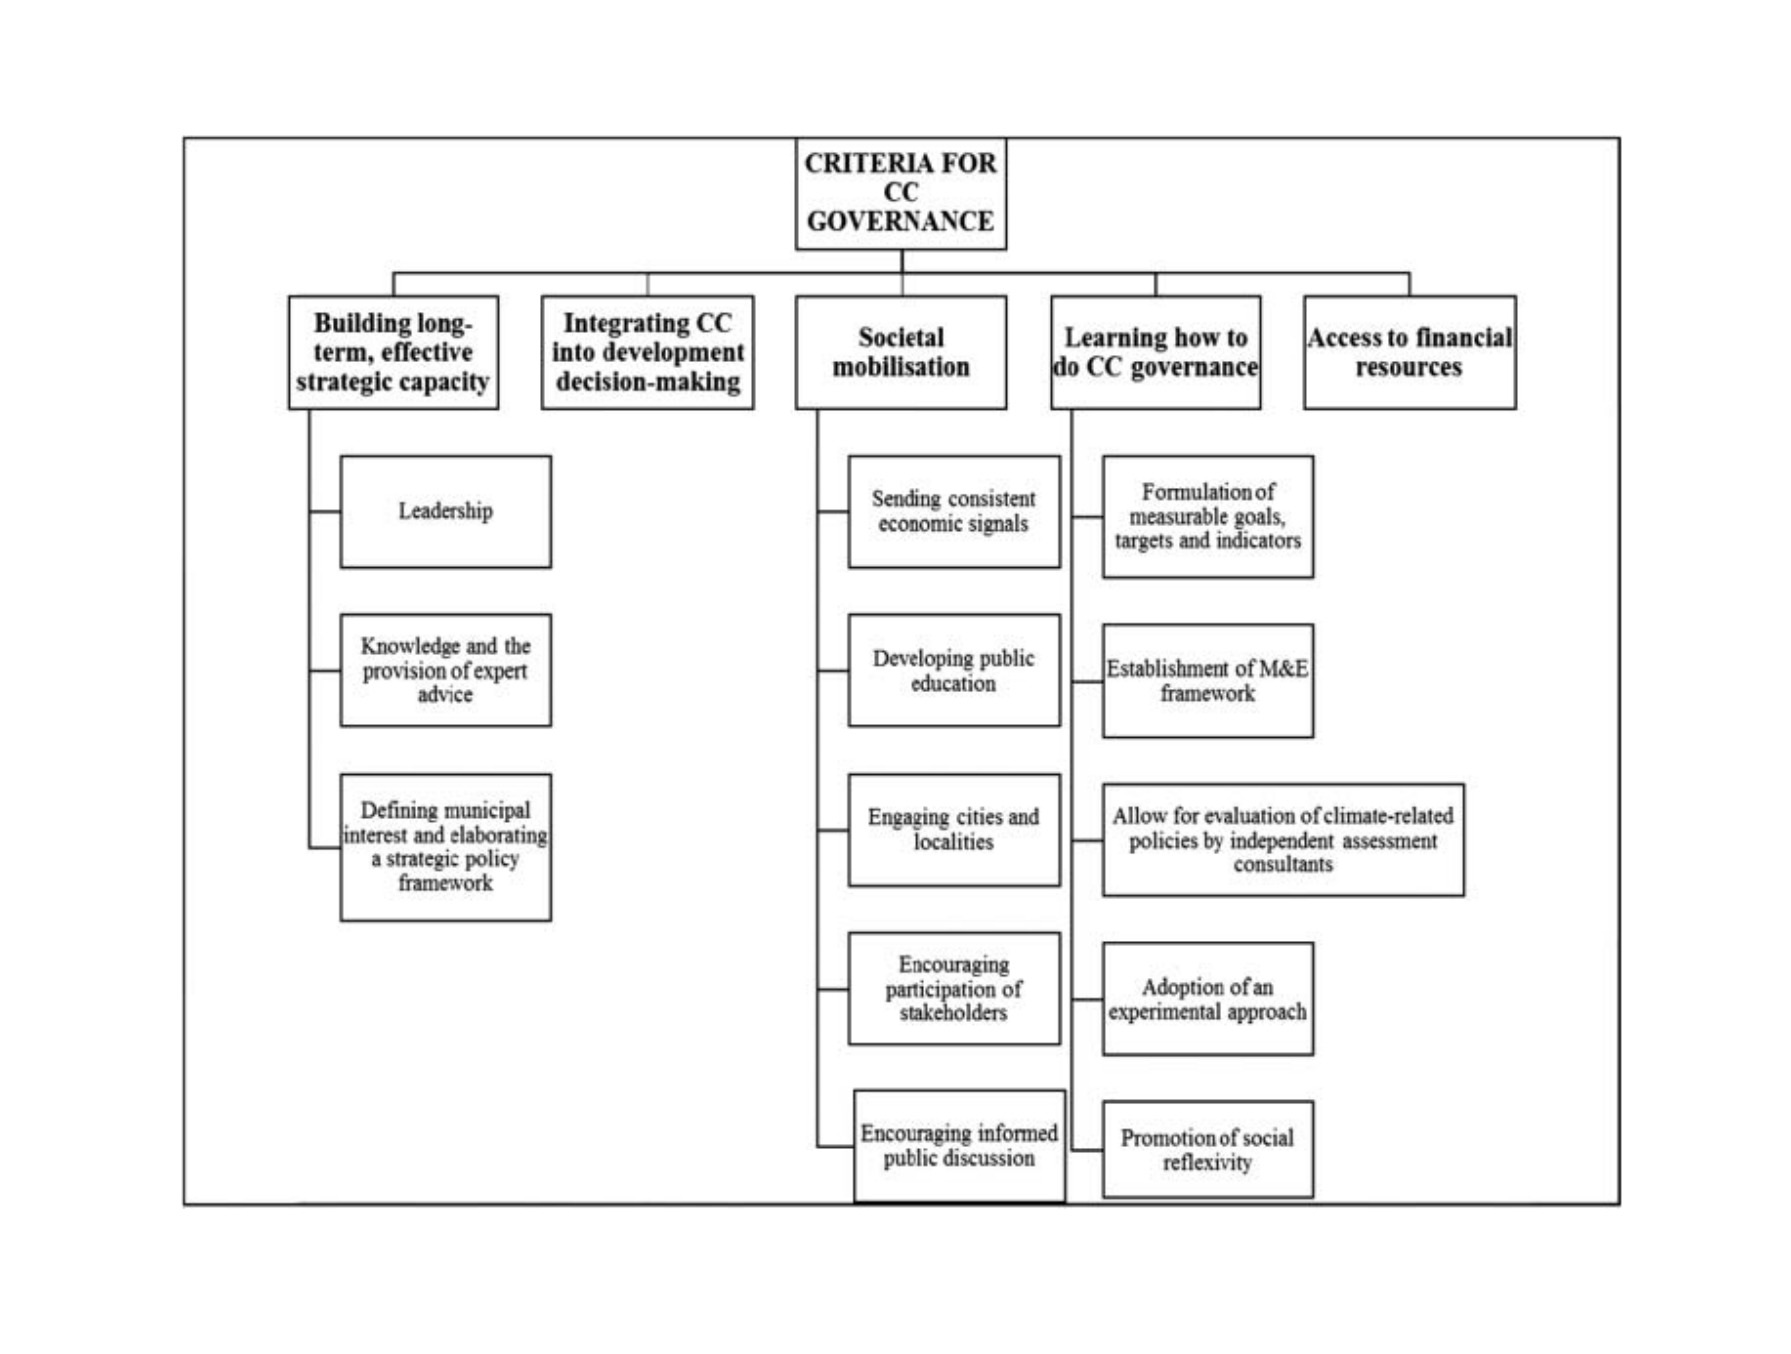 Mind-map describing the Criteria for CC Governance